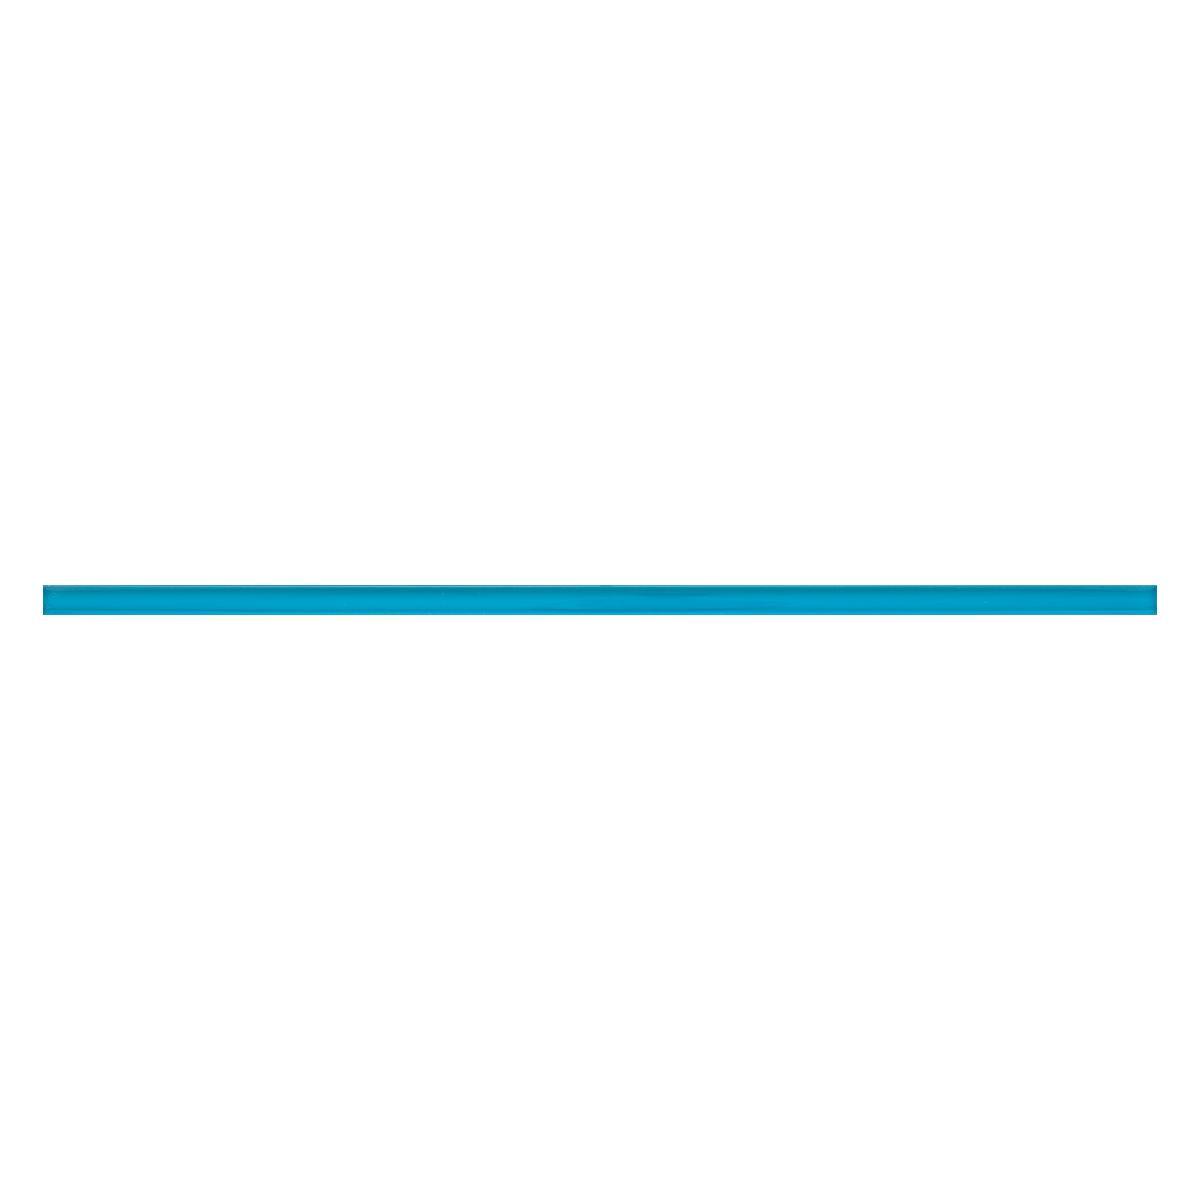 Lapiz Vidrio Aqua Celeste Brillante - 1X39 cm